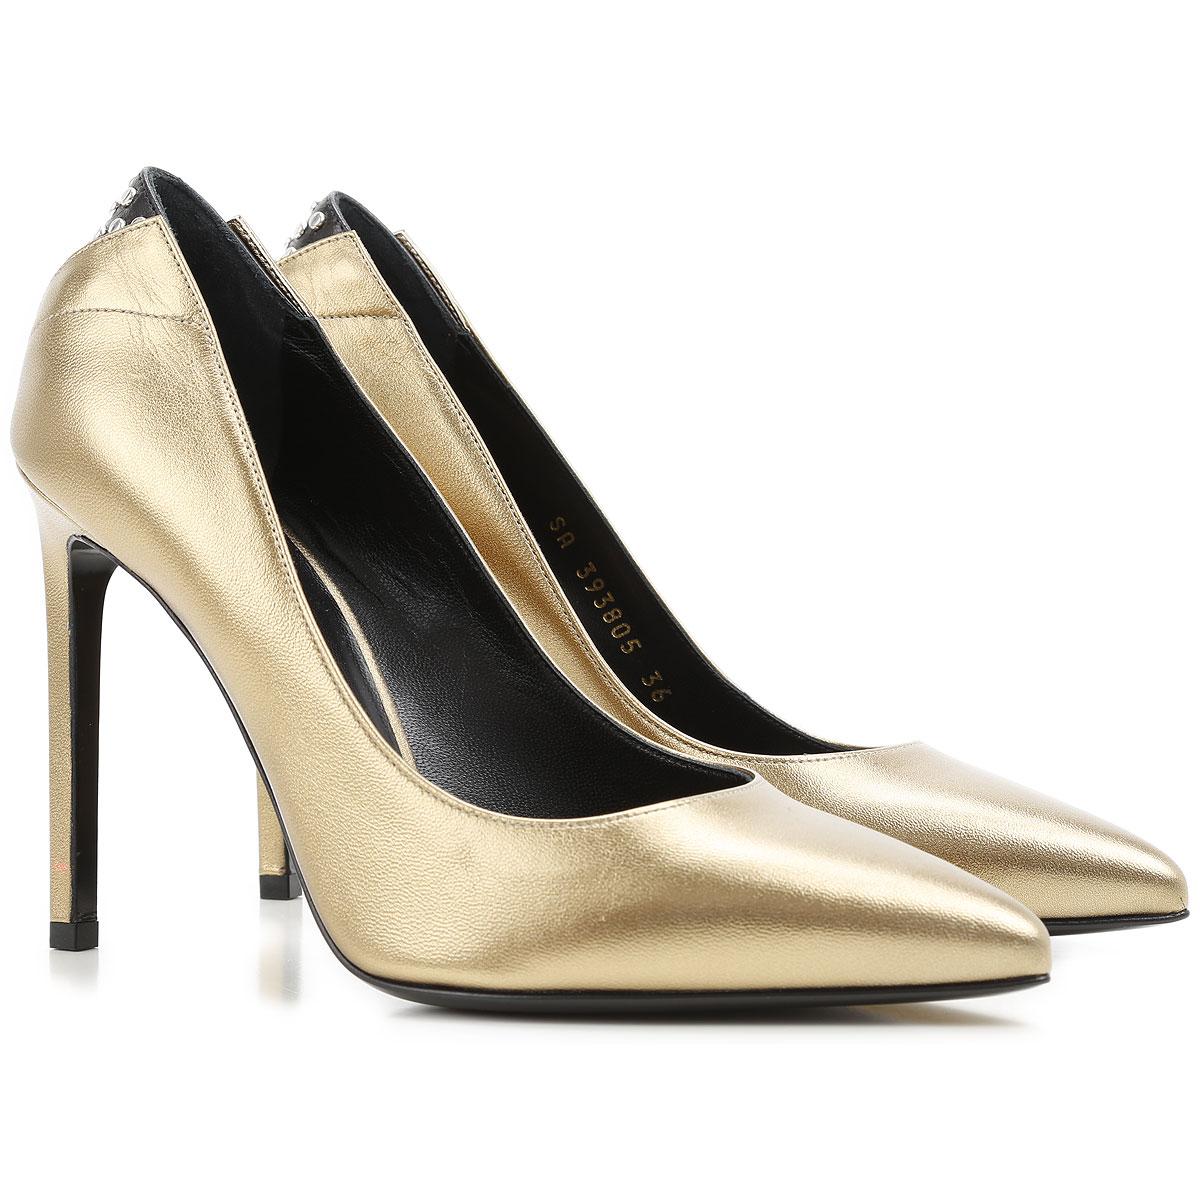 chaussures femme yves saint laurent code produit 393805. Black Bedroom Furniture Sets. Home Design Ideas